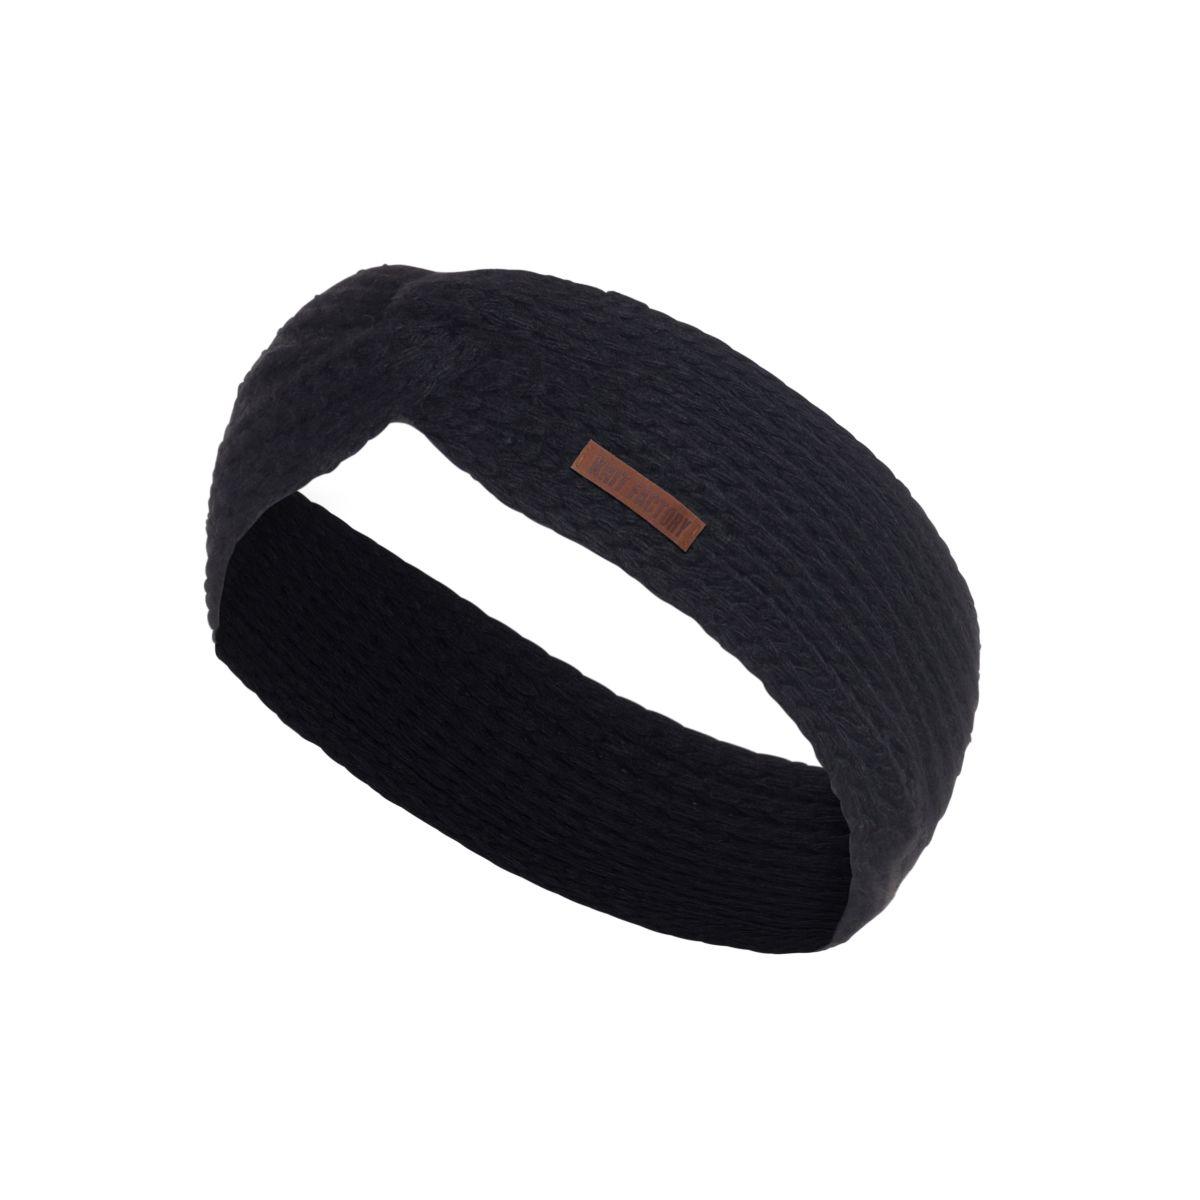 knit factory 1376900 joy hoofdband zwart 1